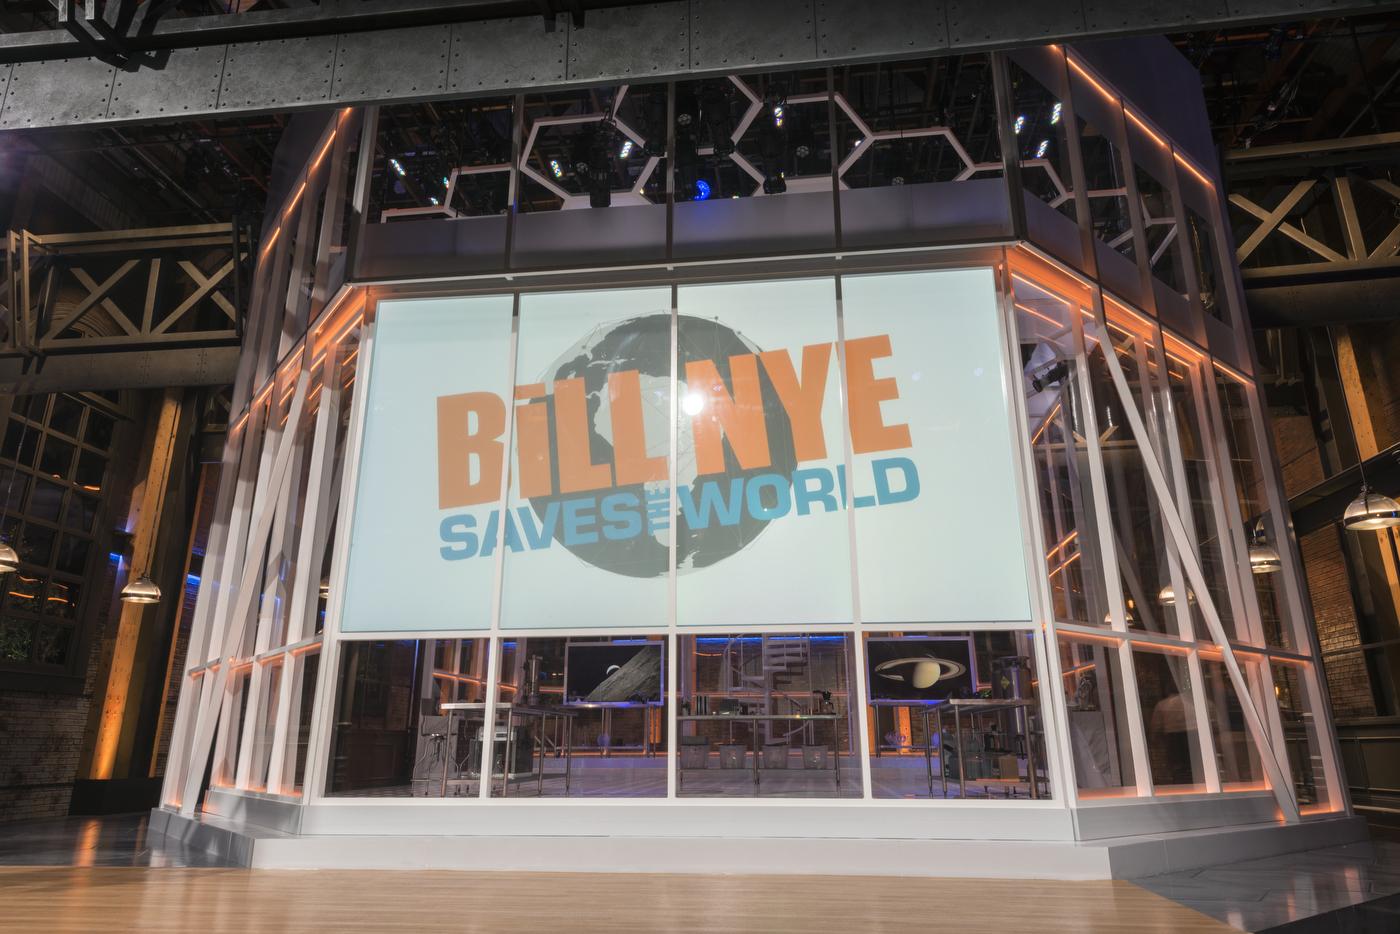 NCS_Bill-Nye-Saves-The-World_studio_0009